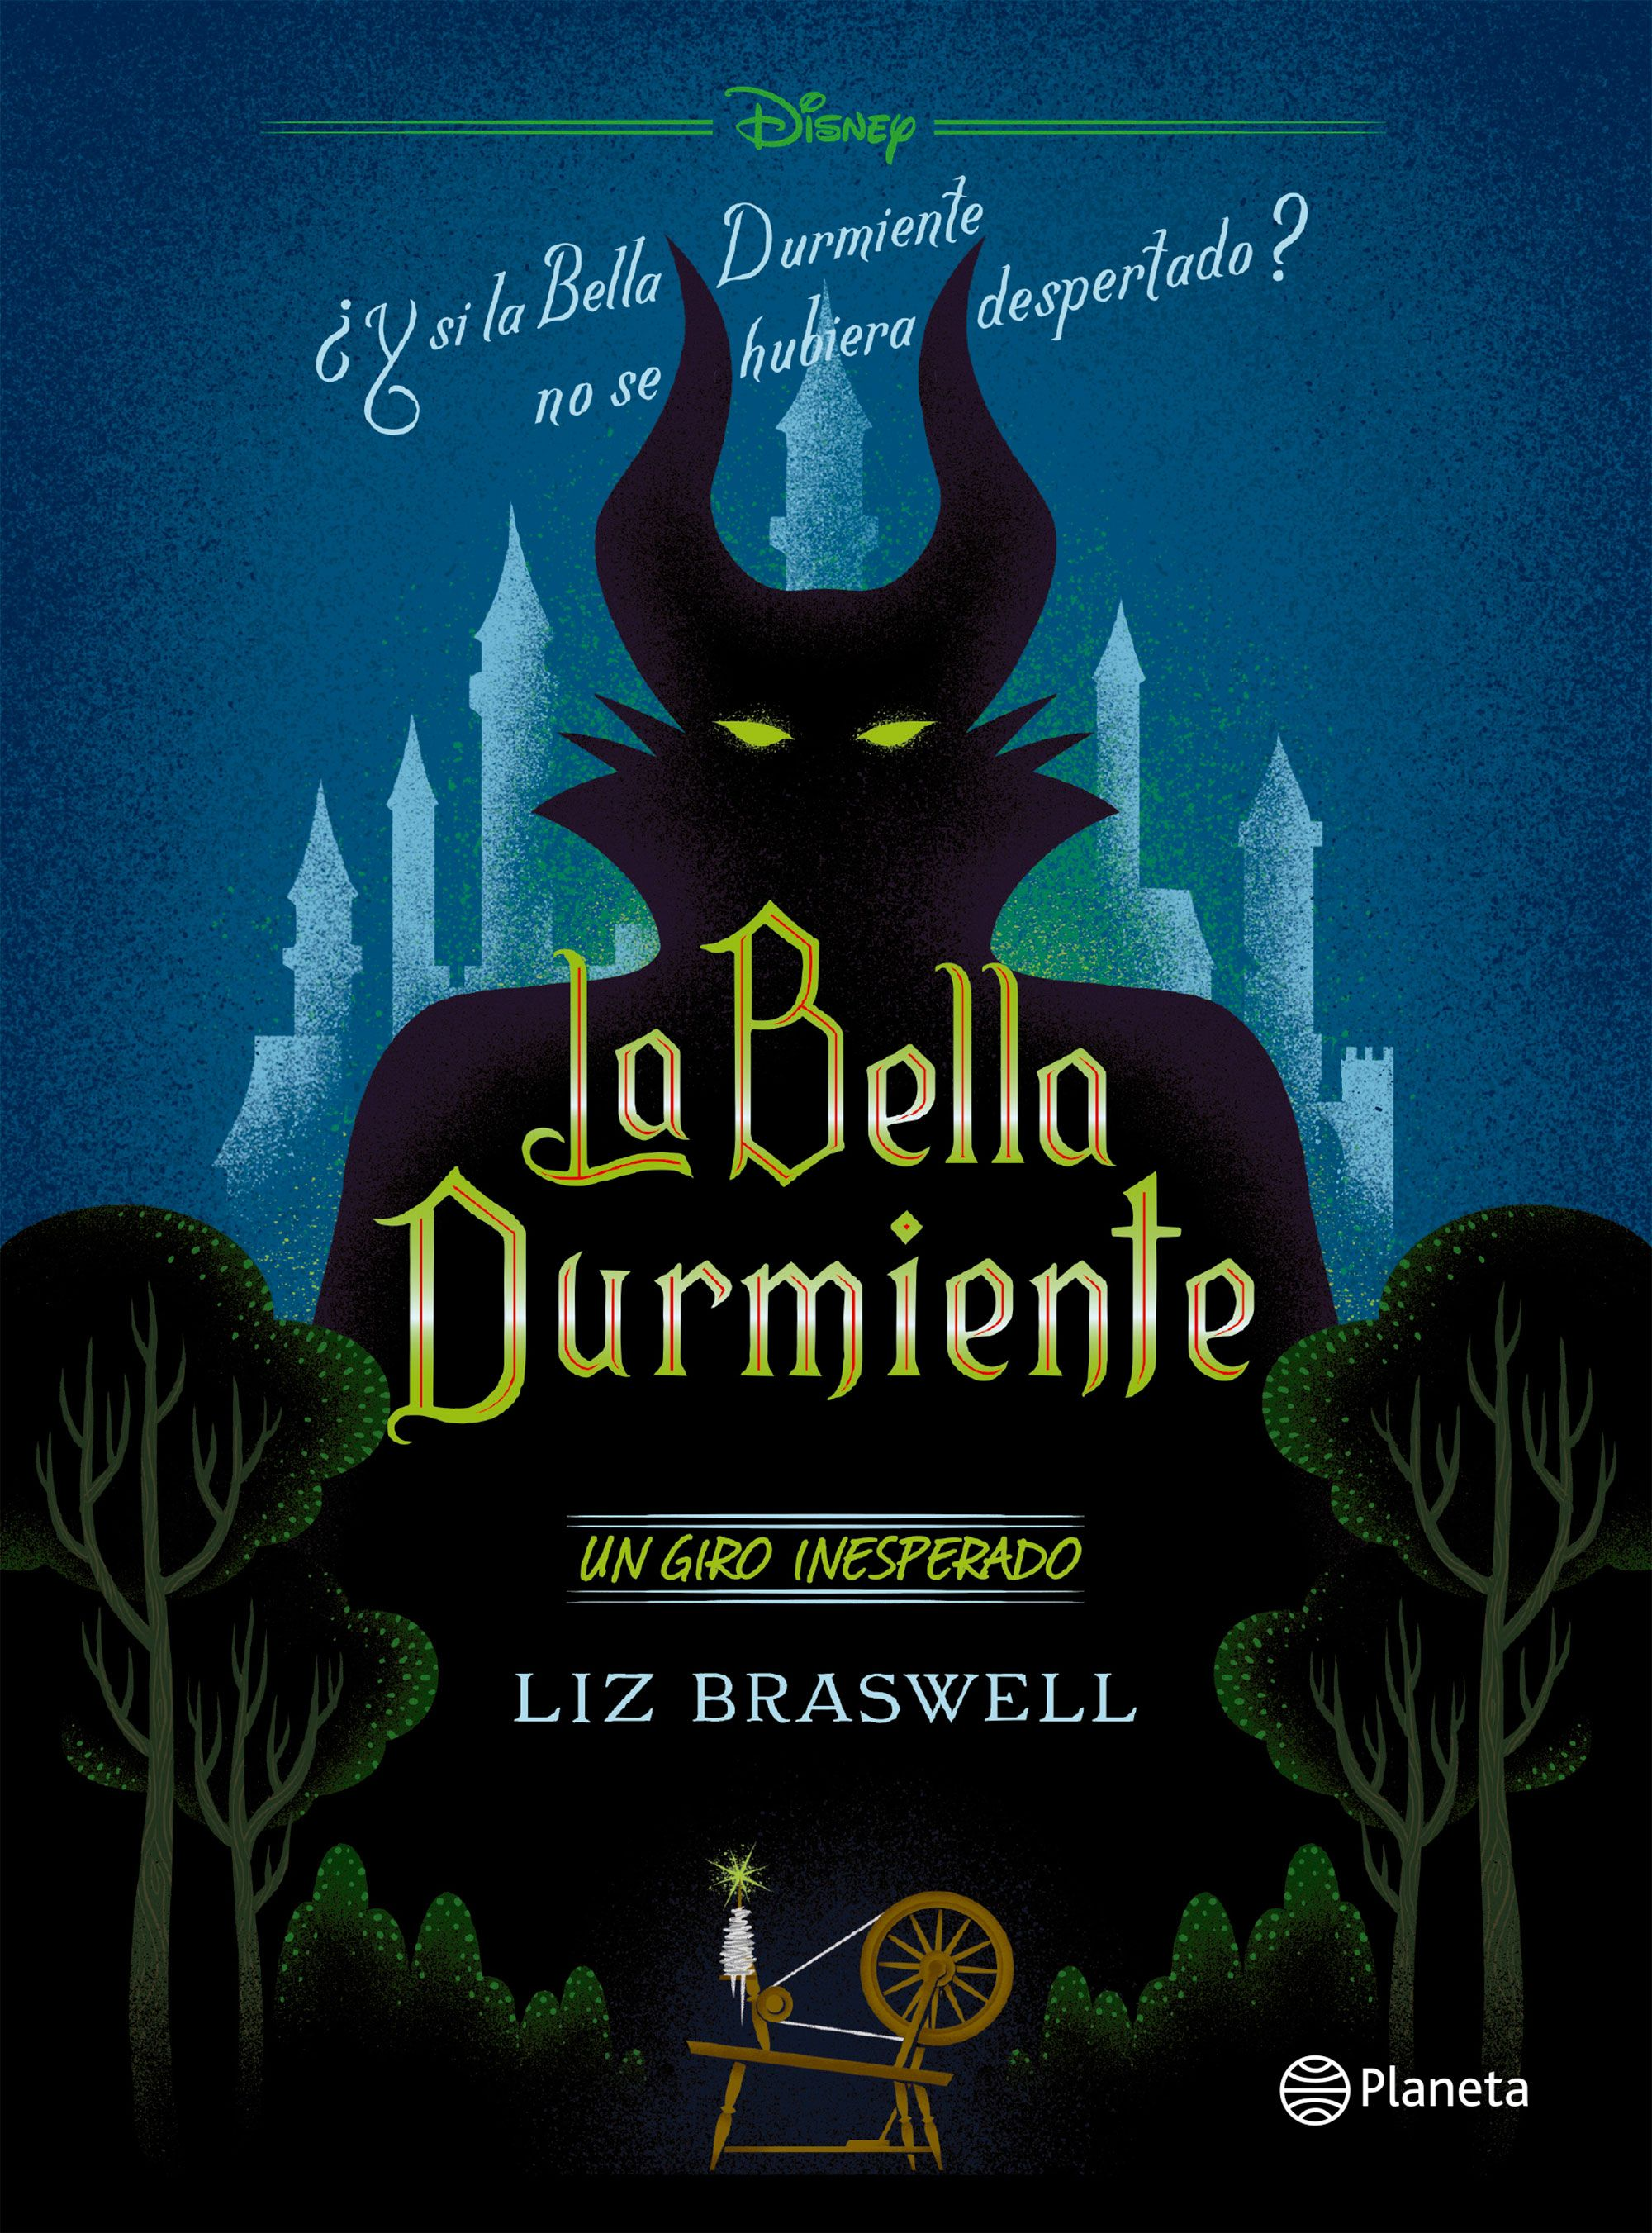 La Bella Durmiente. Un Giro Inesperado - Disney - Planeta